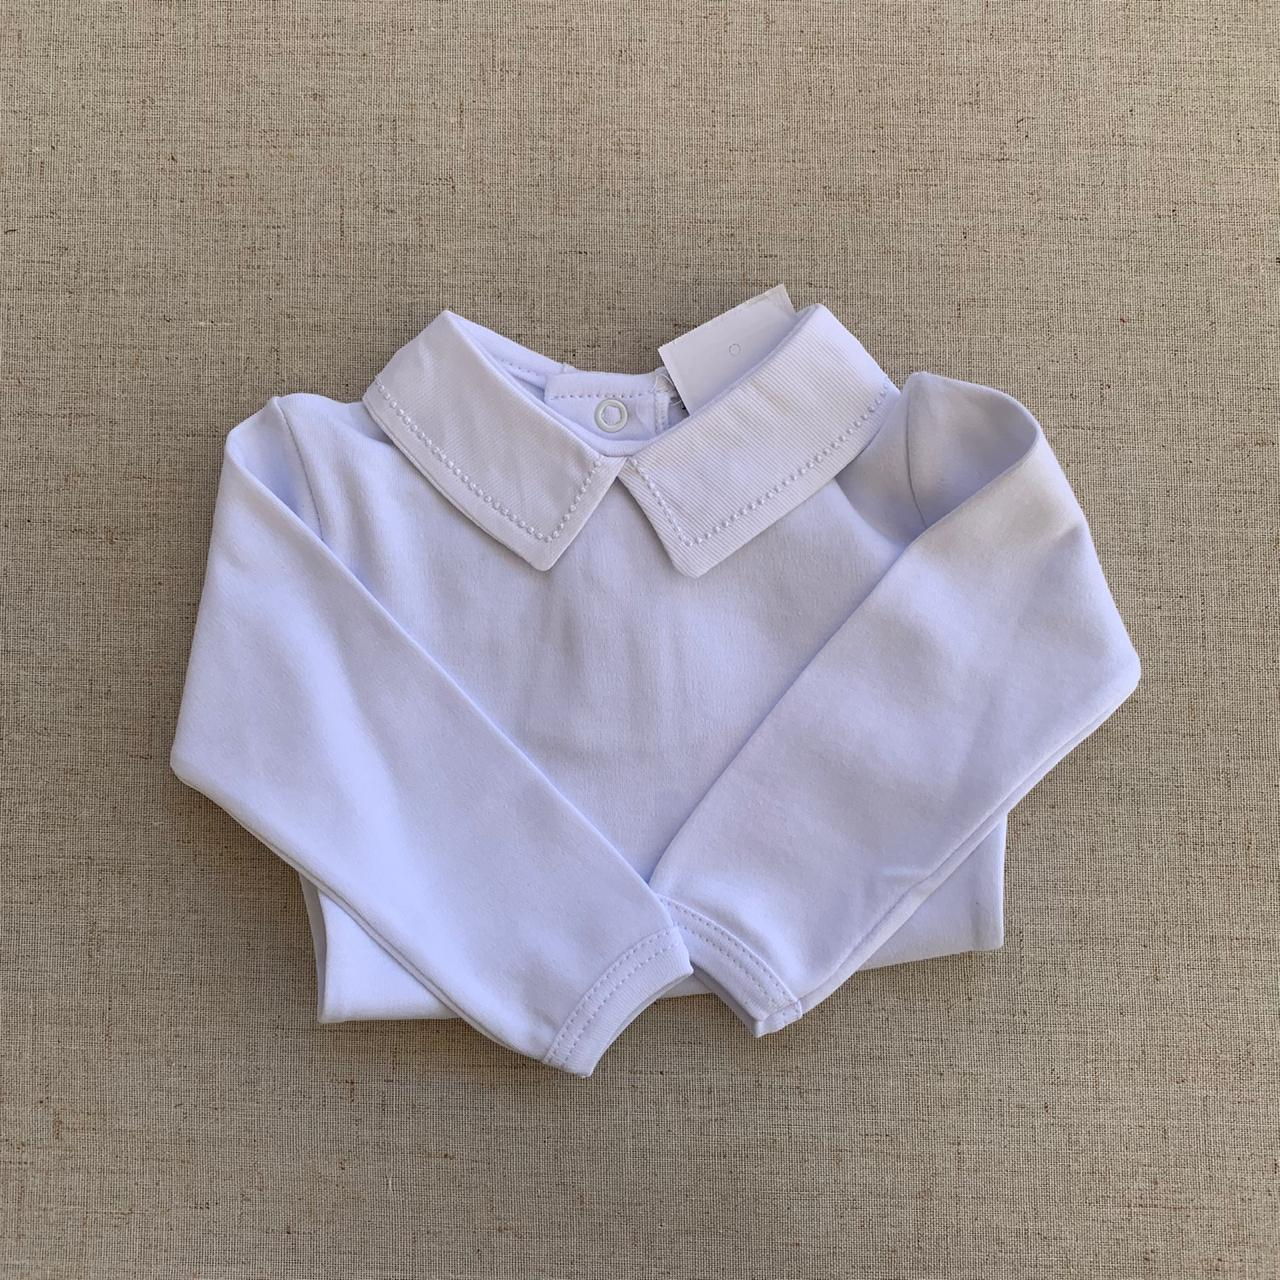 Body golinha branca bordada de branco